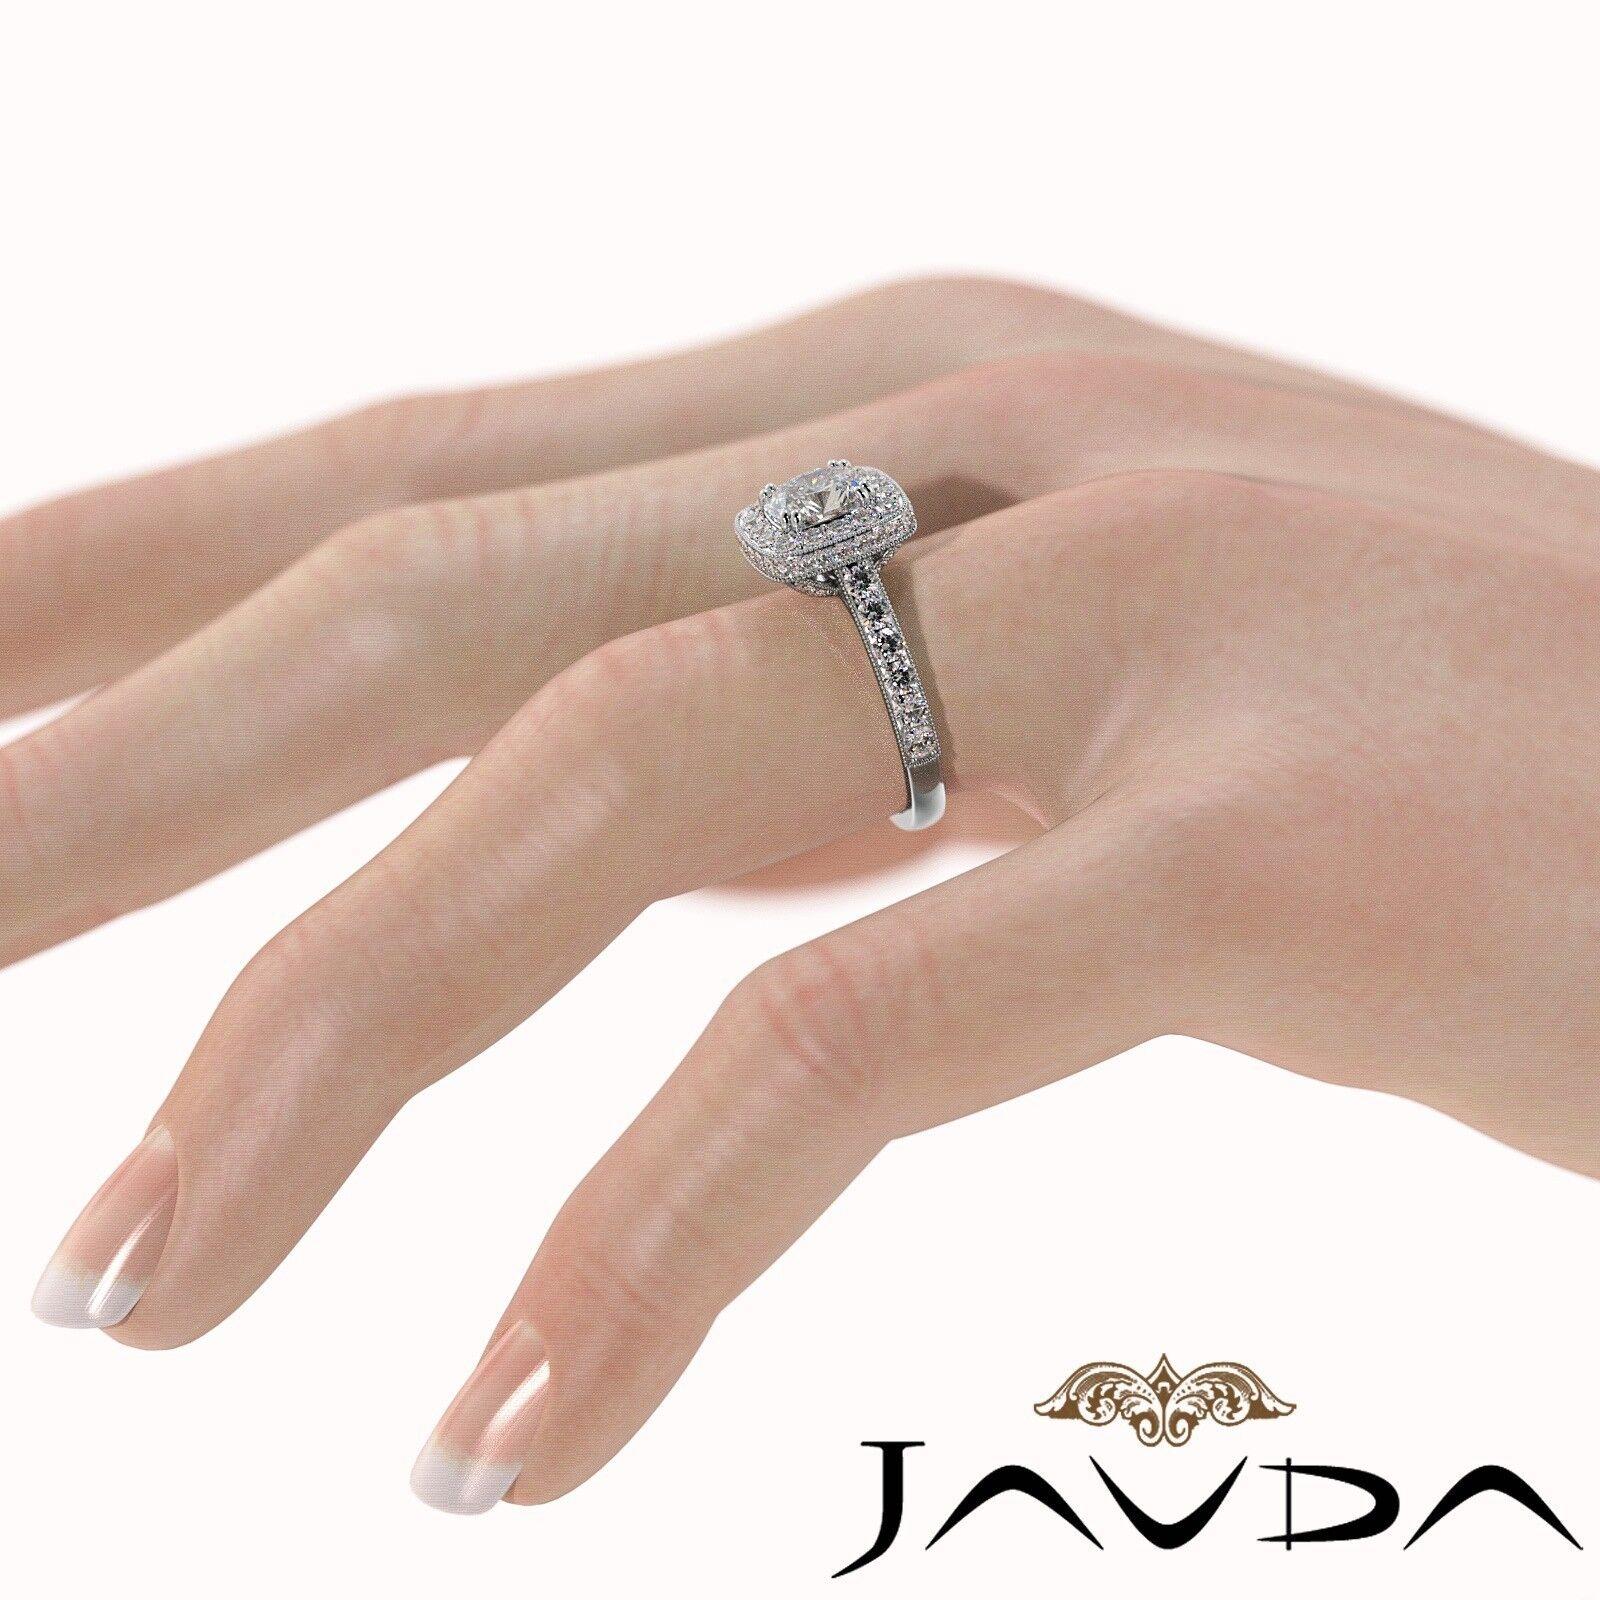 1.94ctw Milgrain Floral Basket Cushion Diamond Engagement Ring GIA E-VVS1 W Gold 4